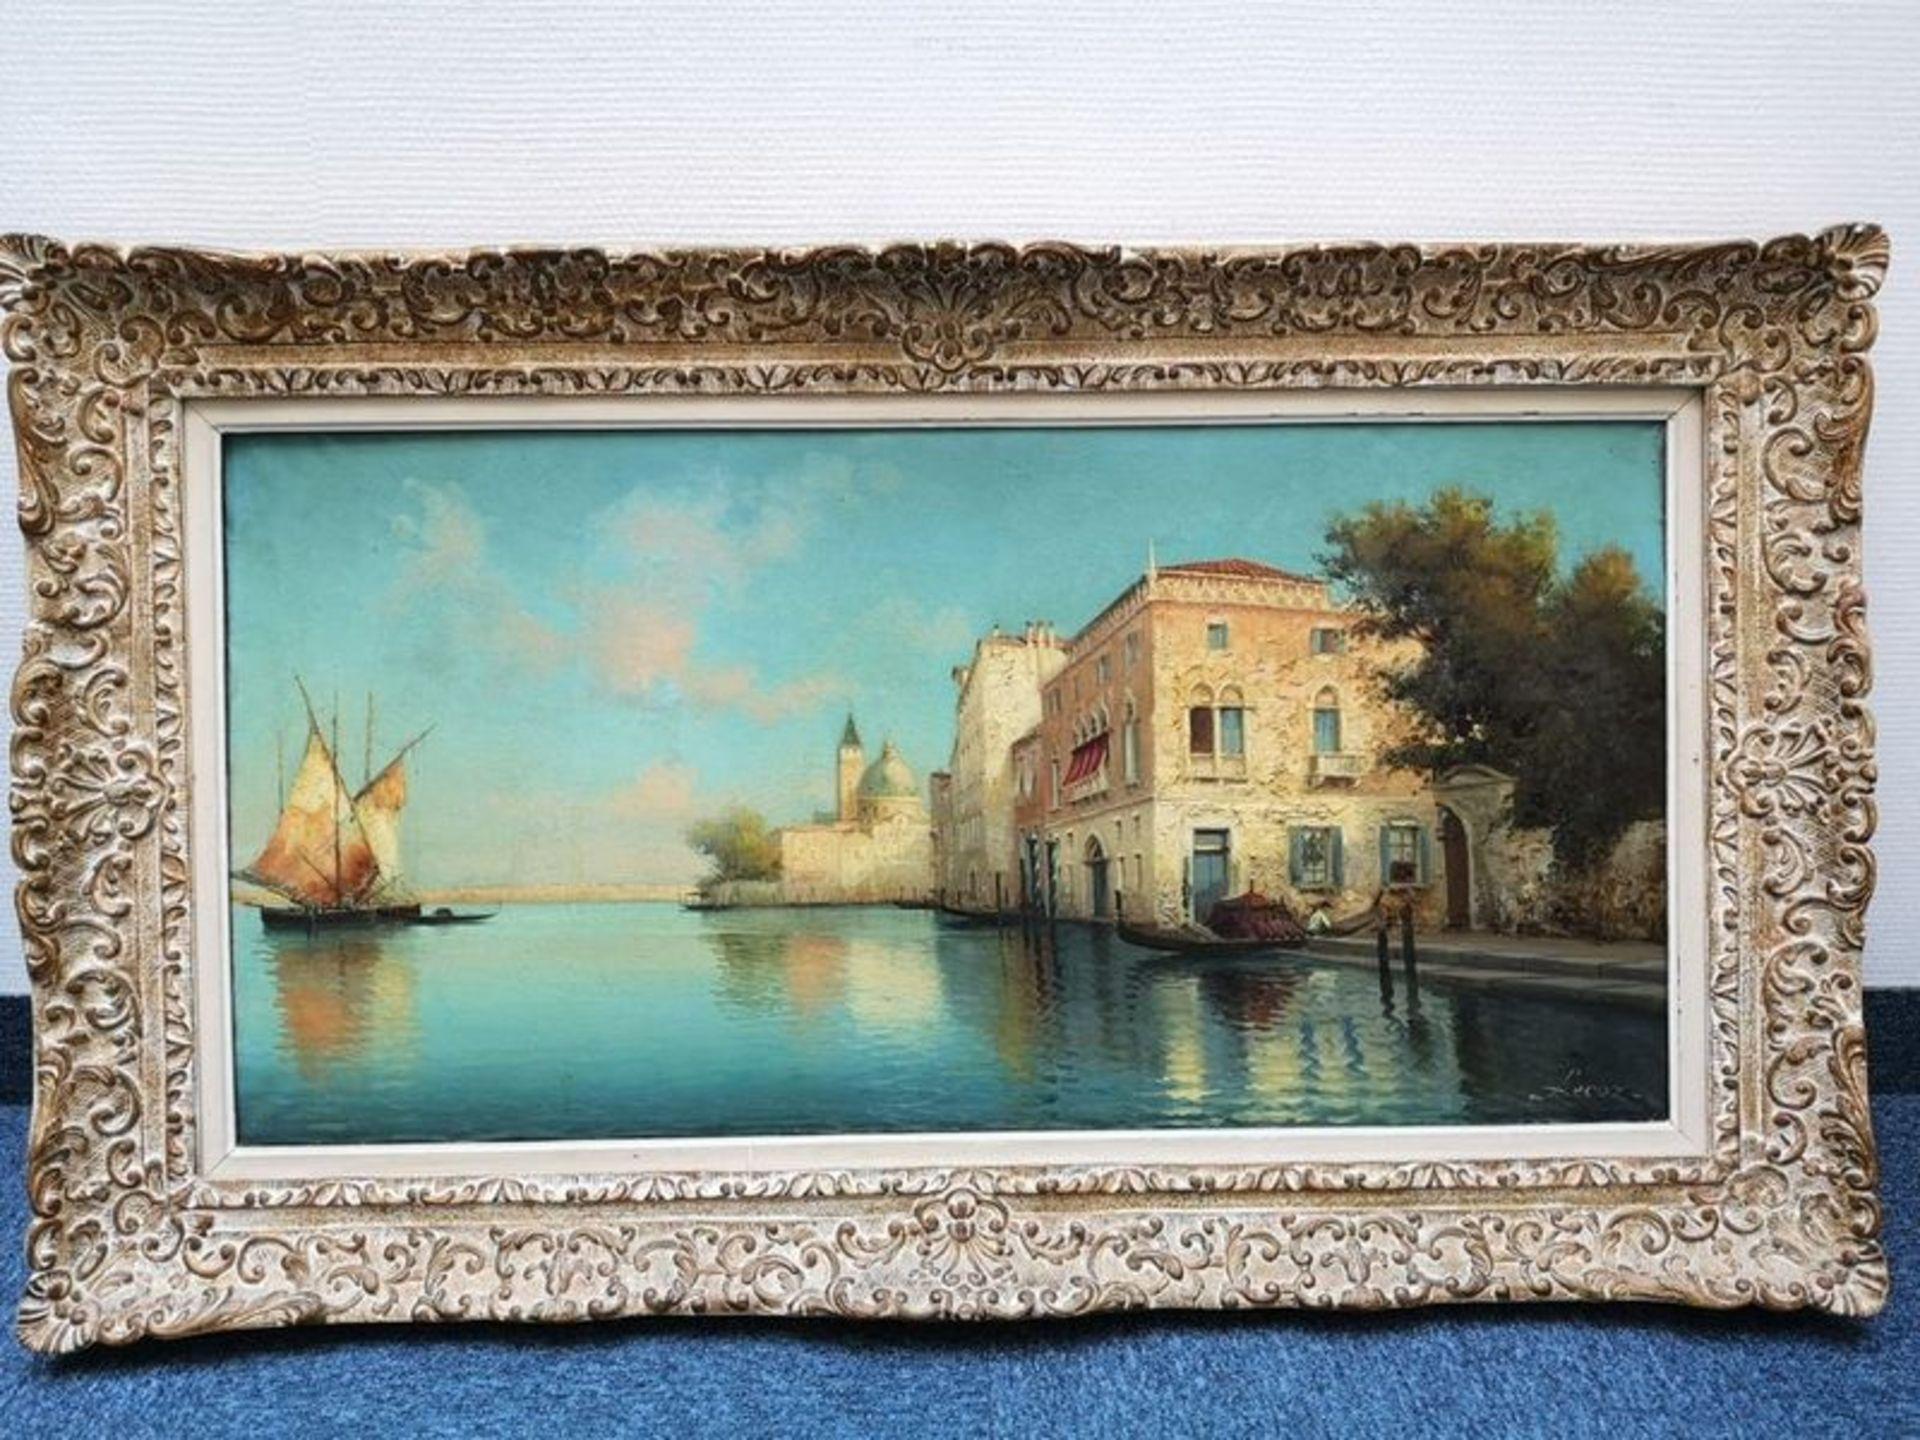 Alphonse LECOZ (XIX-XX) Venetian canal - Signed 'Lecoz' (lower right) Oil on [...] - Bild 2 aus 2